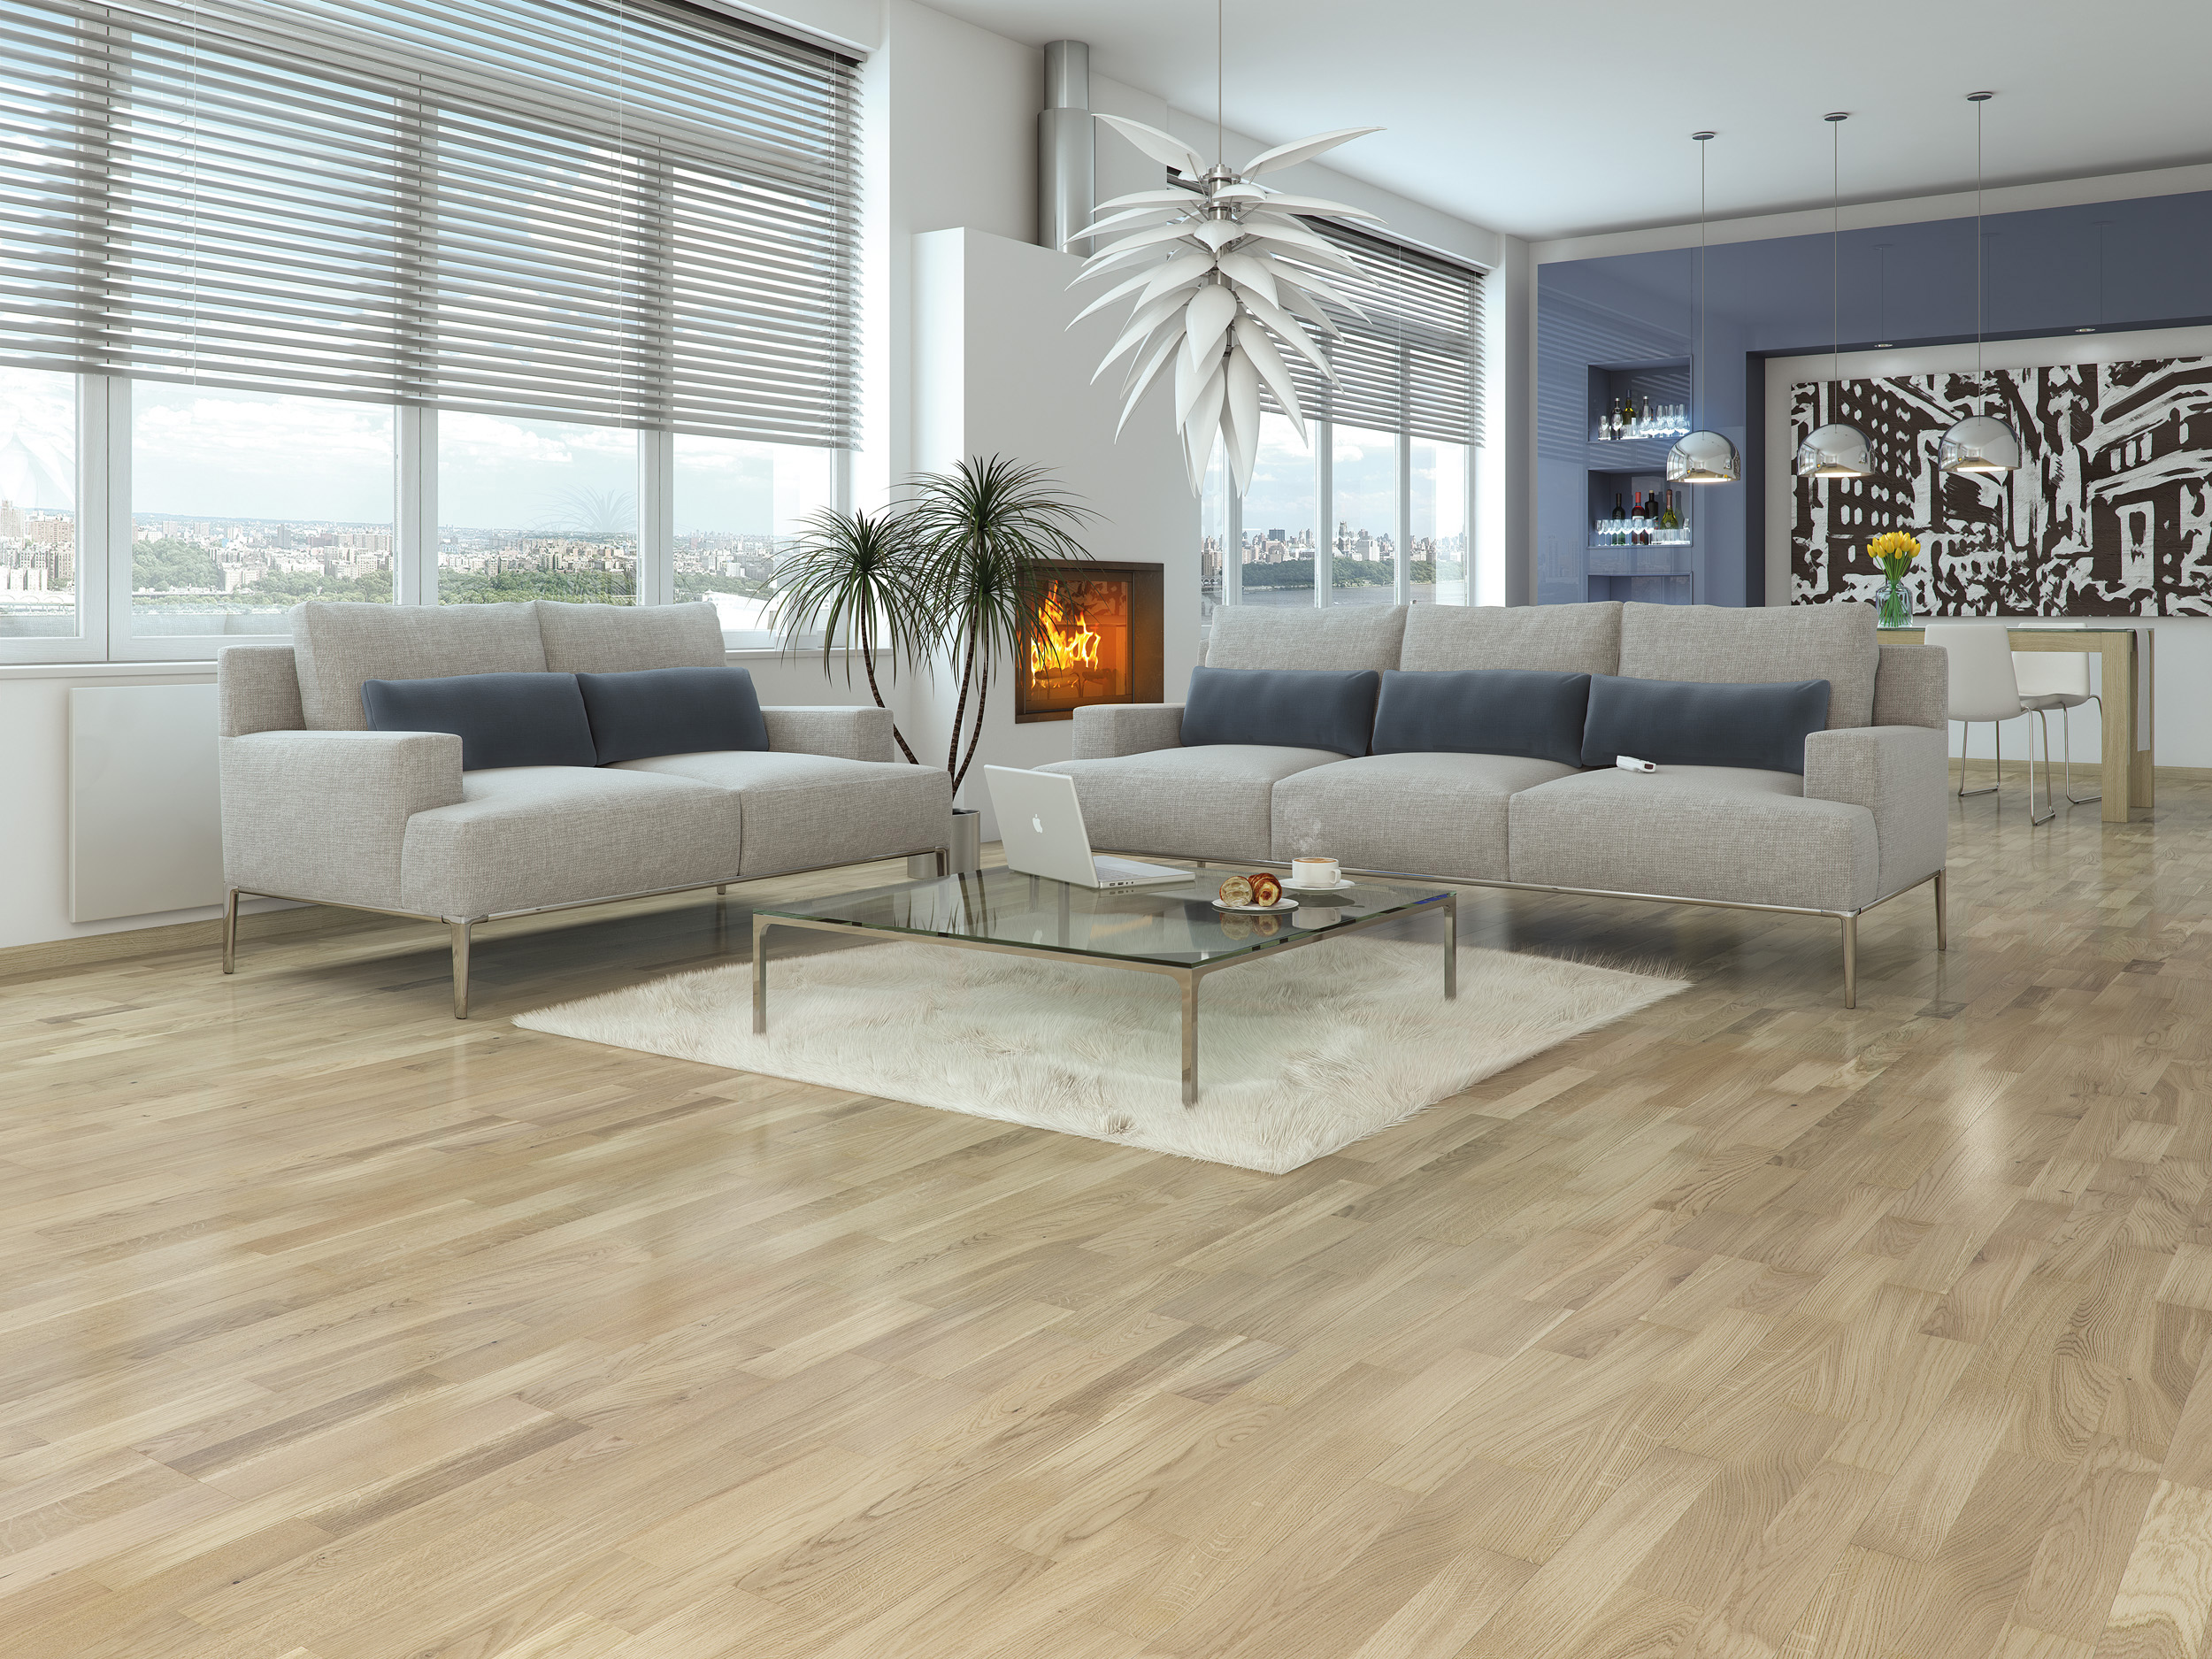 parkett eiche intensive maserung daedelow parkett. Black Bedroom Furniture Sets. Home Design Ideas